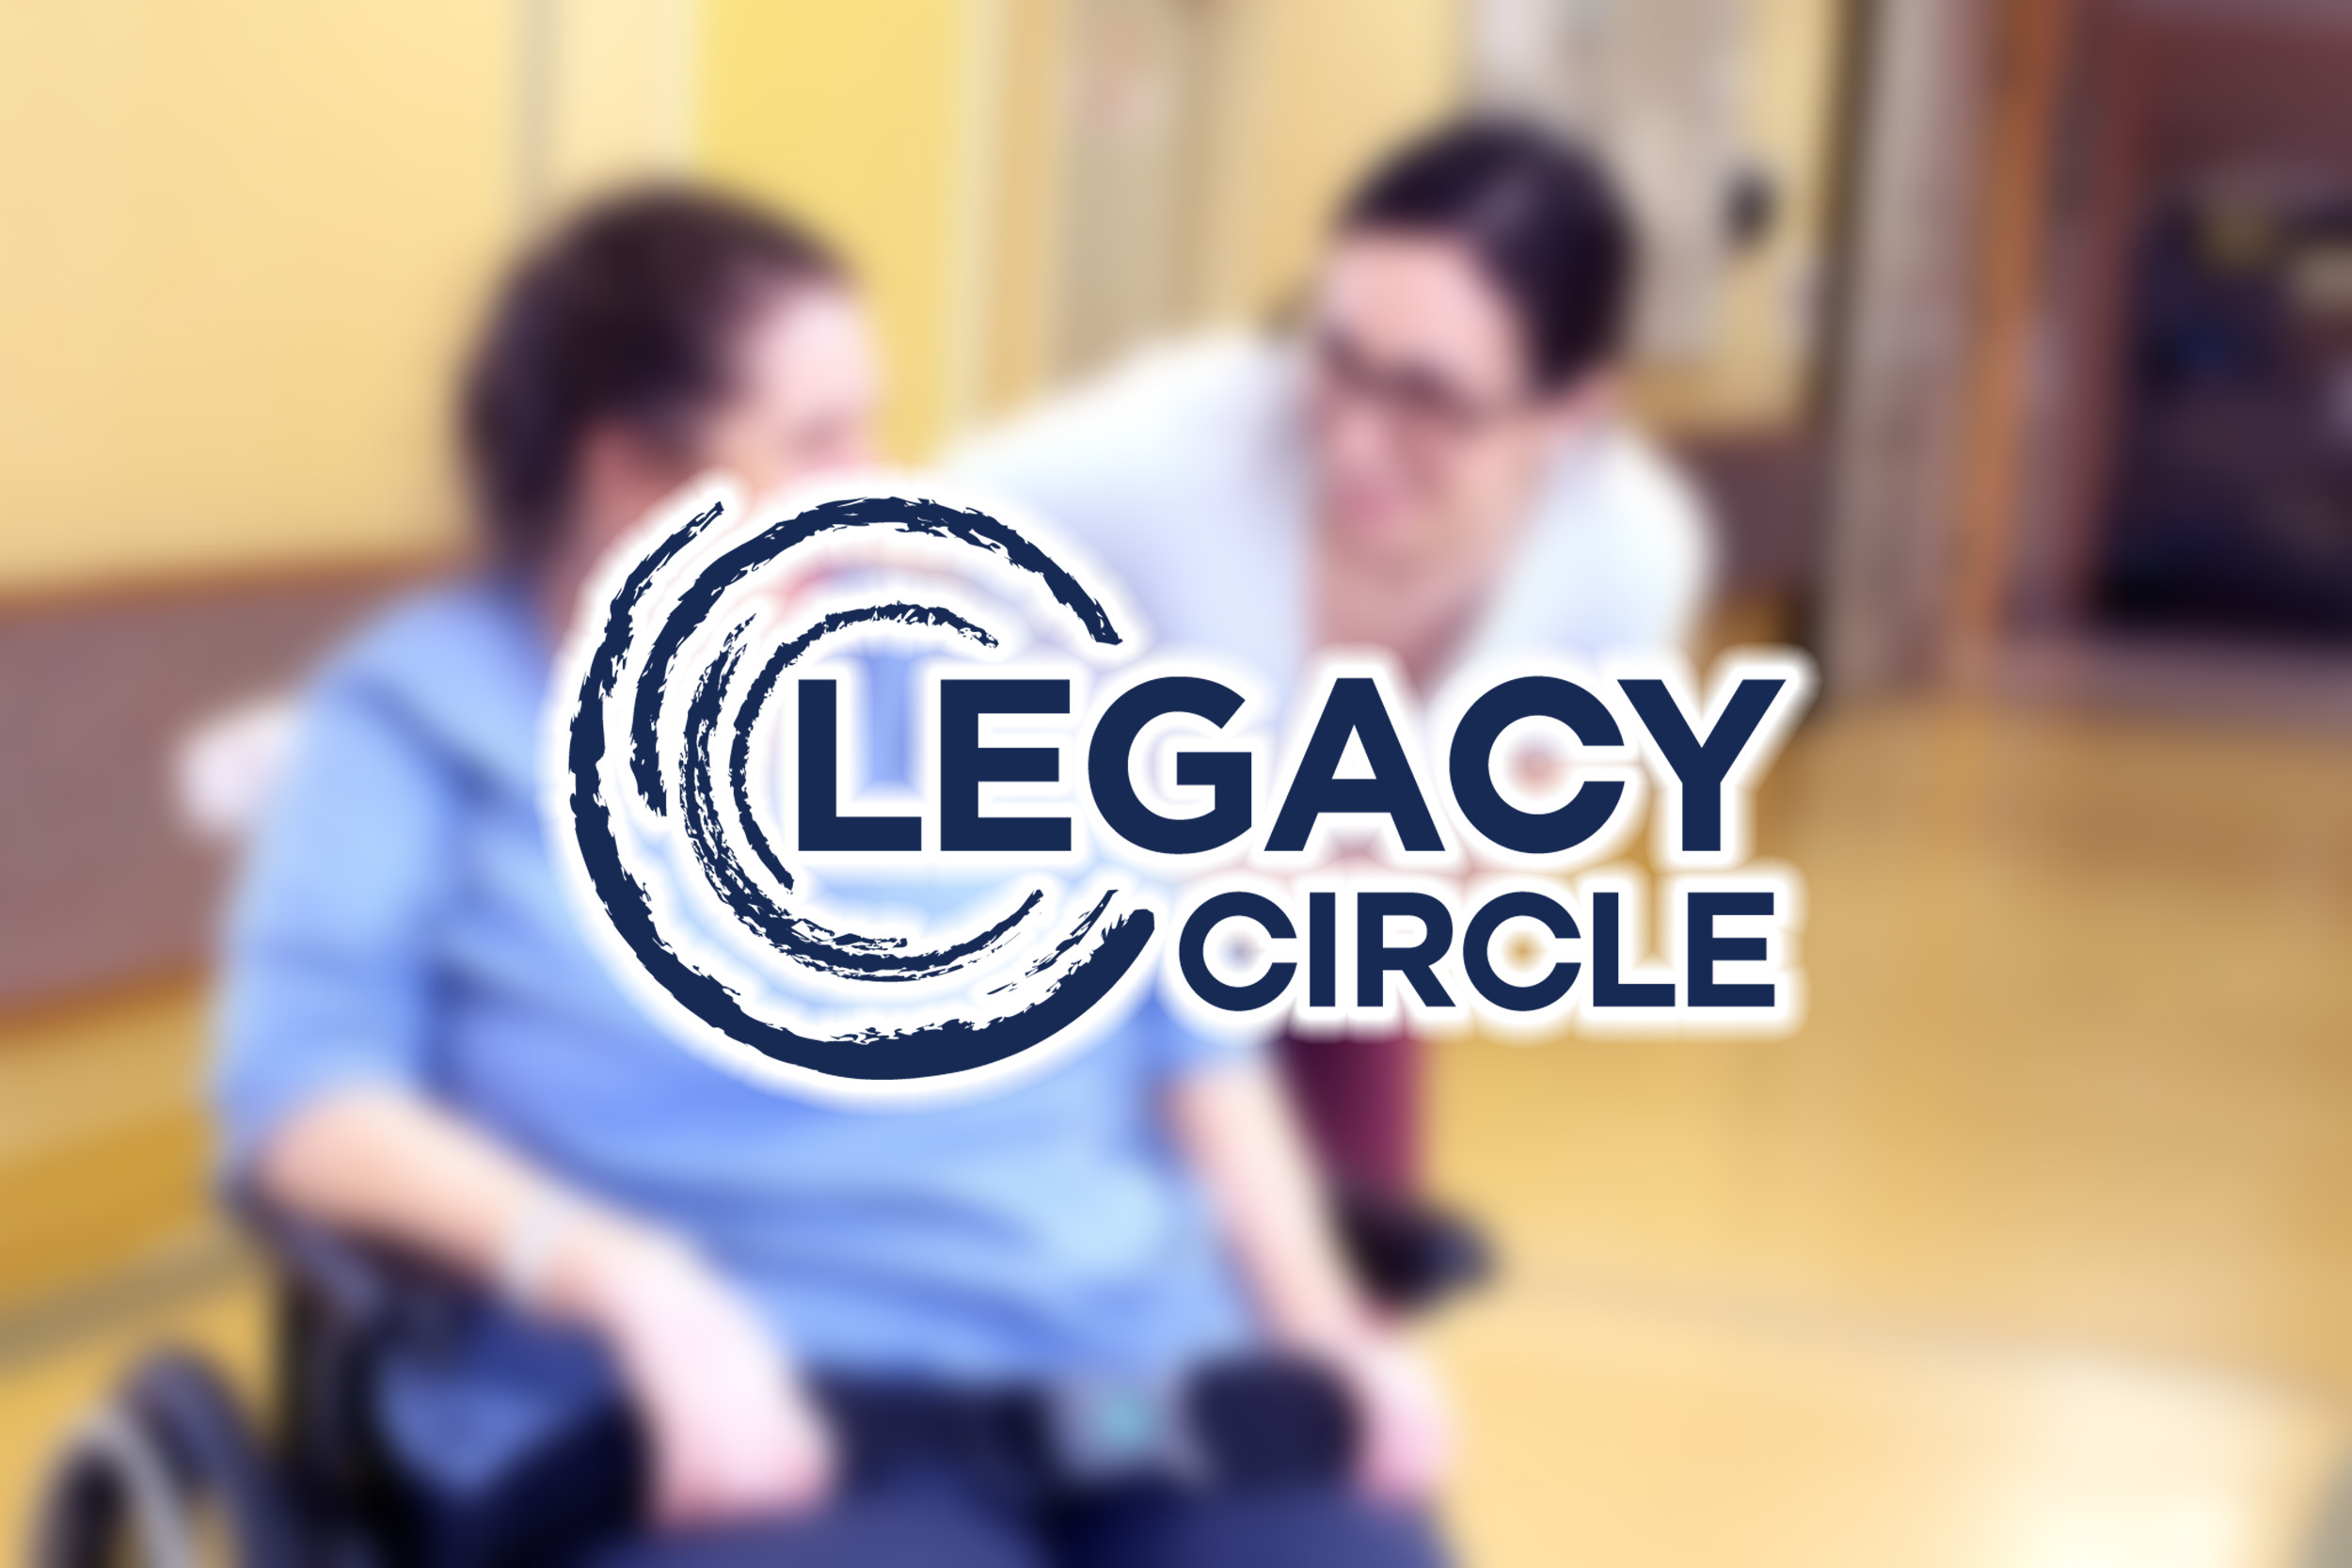 The Legacy Circle logo